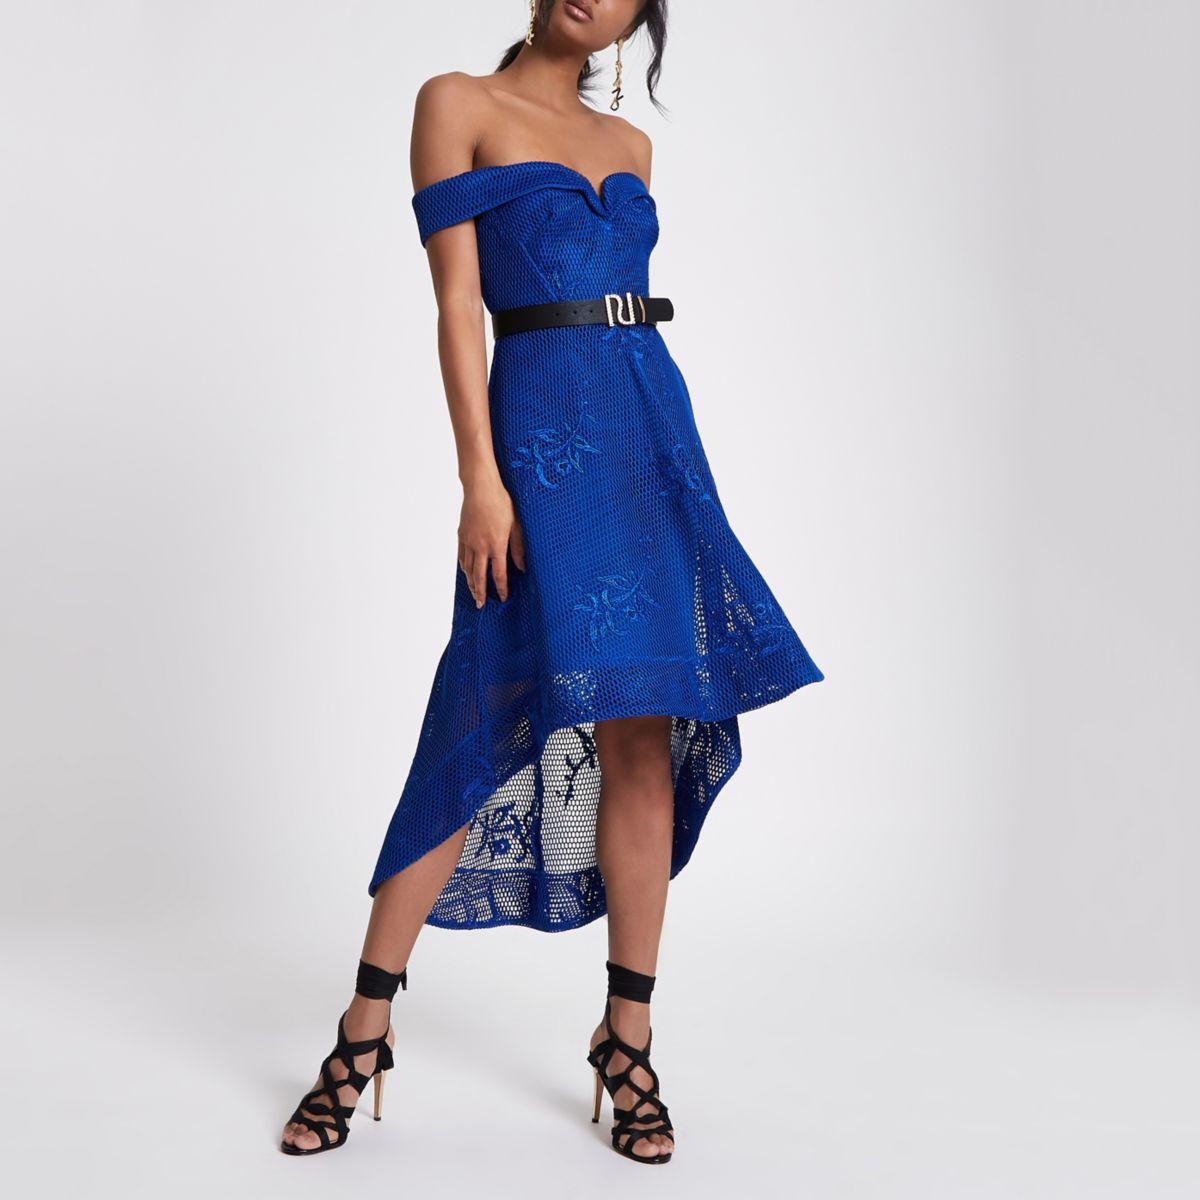 Blue Bardot Mesh Drop Hem Dress                                  Blue Bardot Mesh Drop Hem Dress by River Island